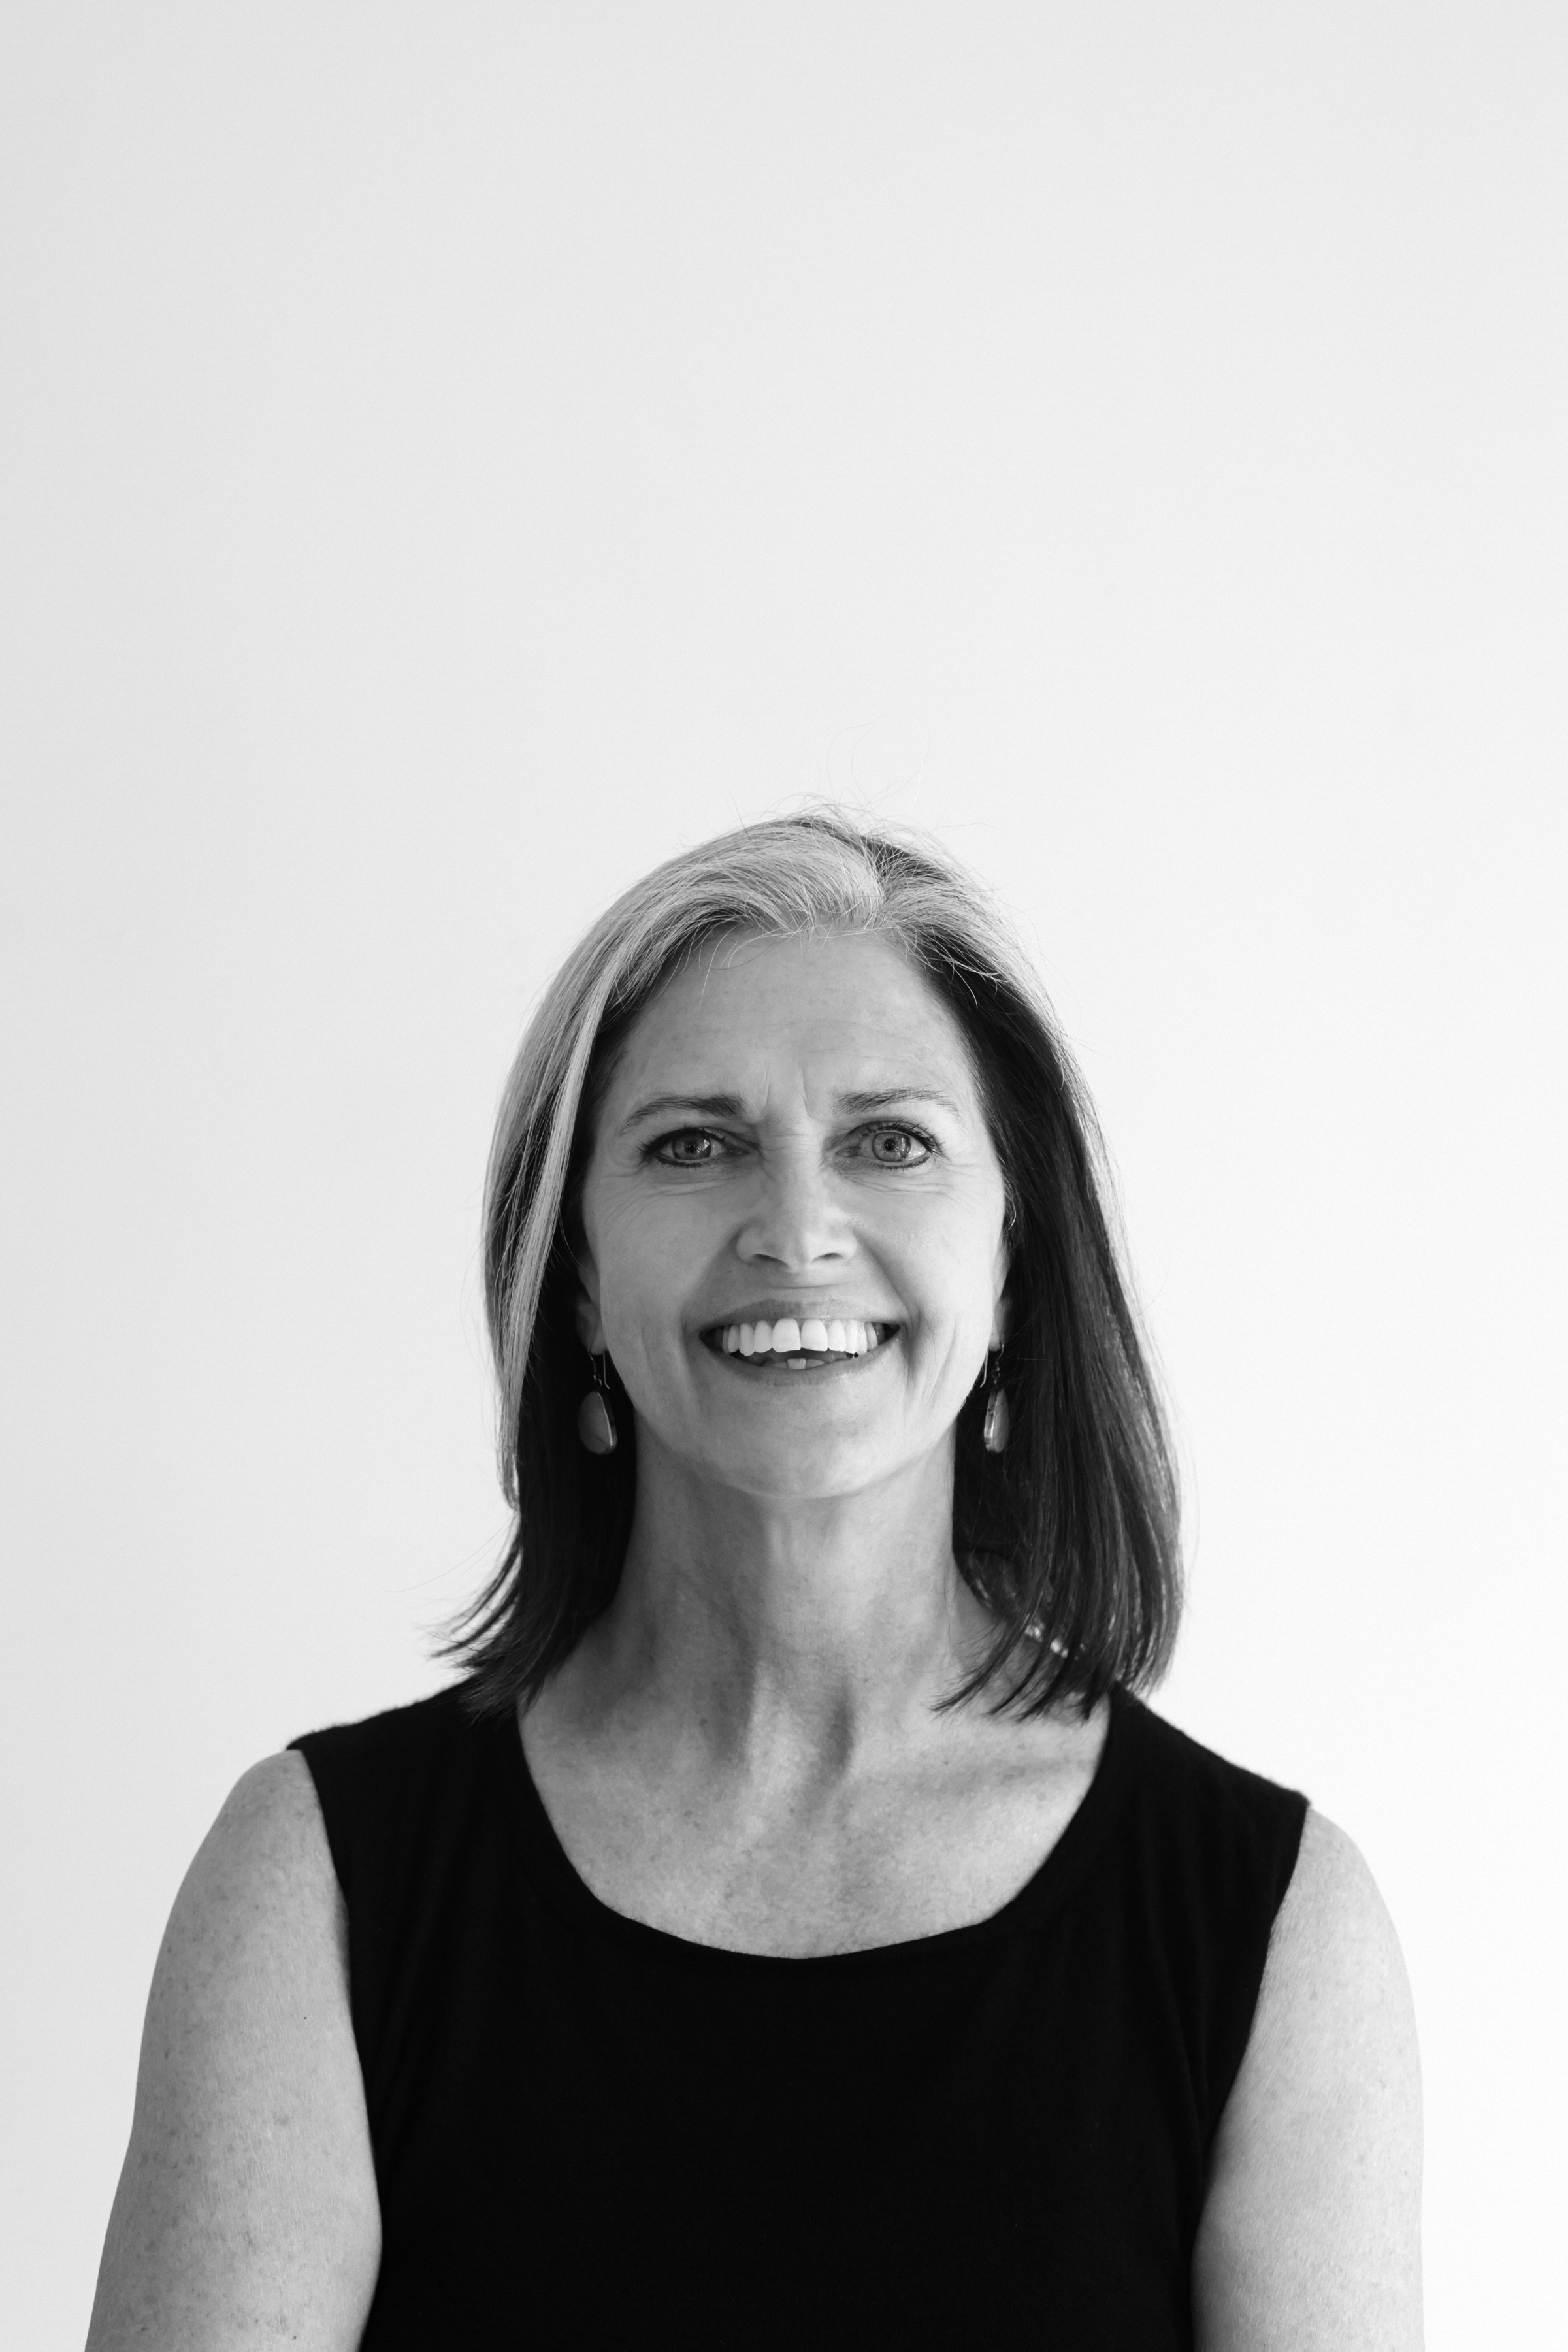 Deborah Berke